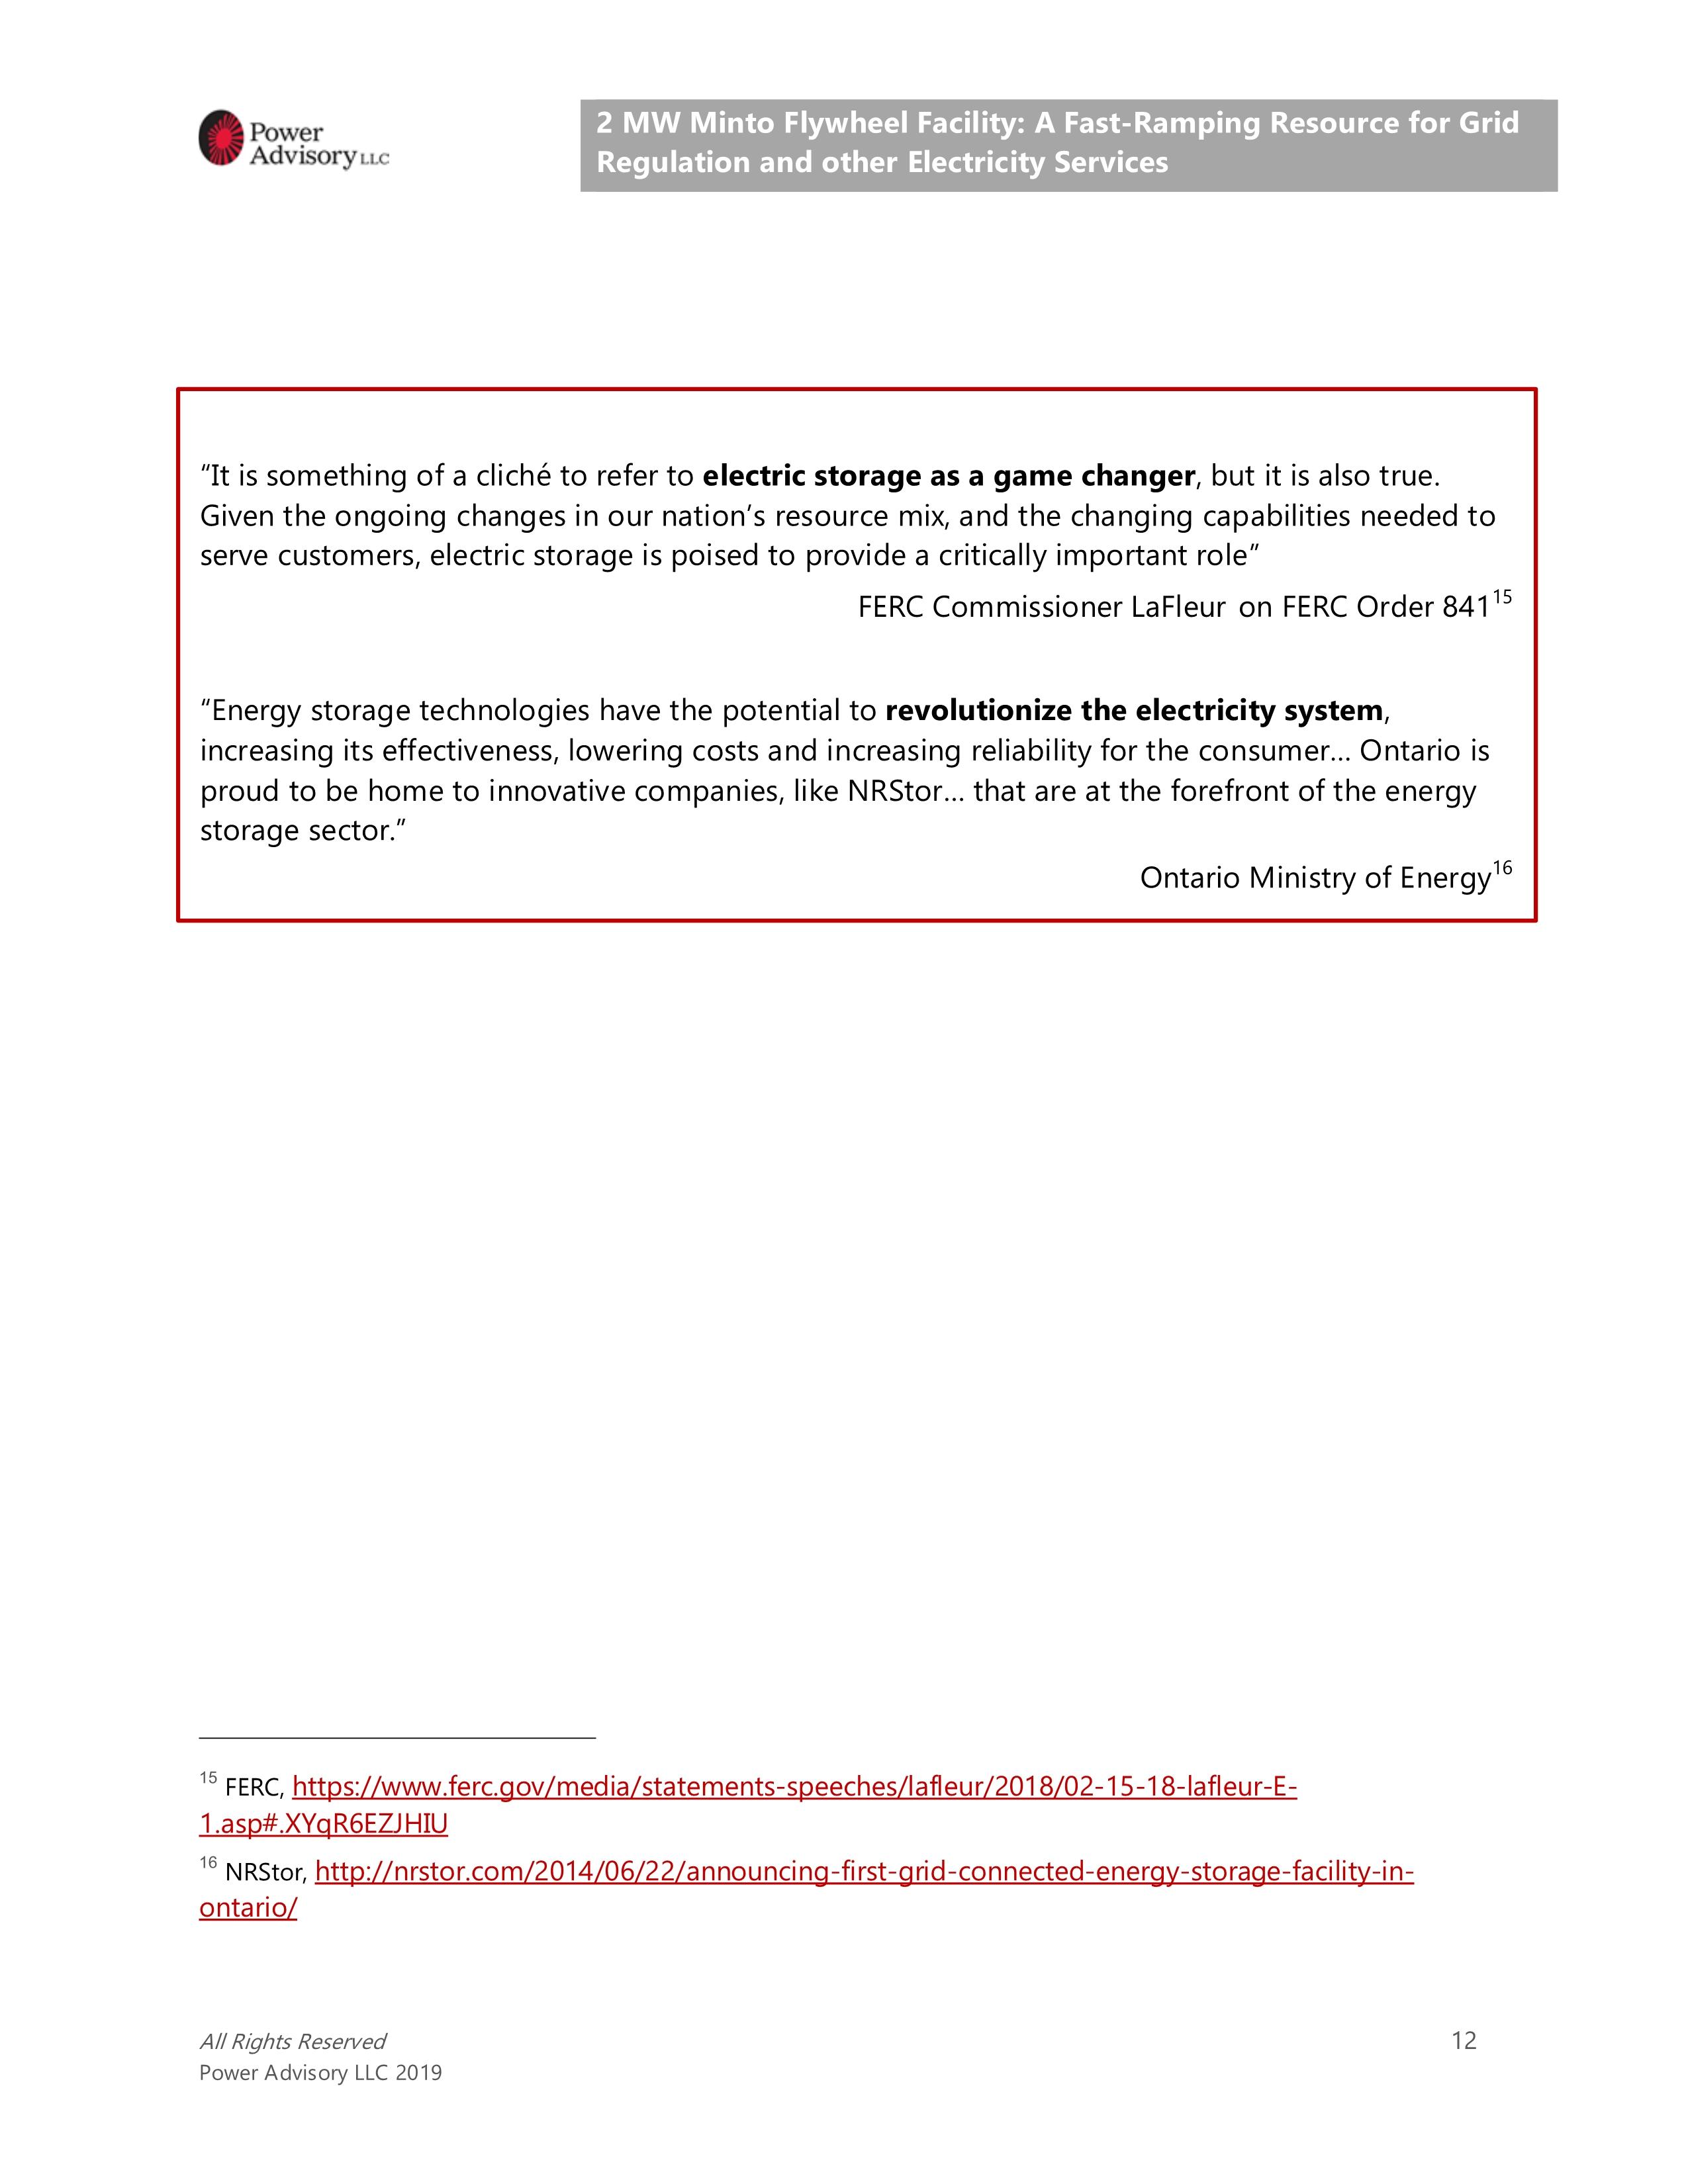 2-MW-Minto-Flywheel-Facility-Case-Study-4_1.jpg